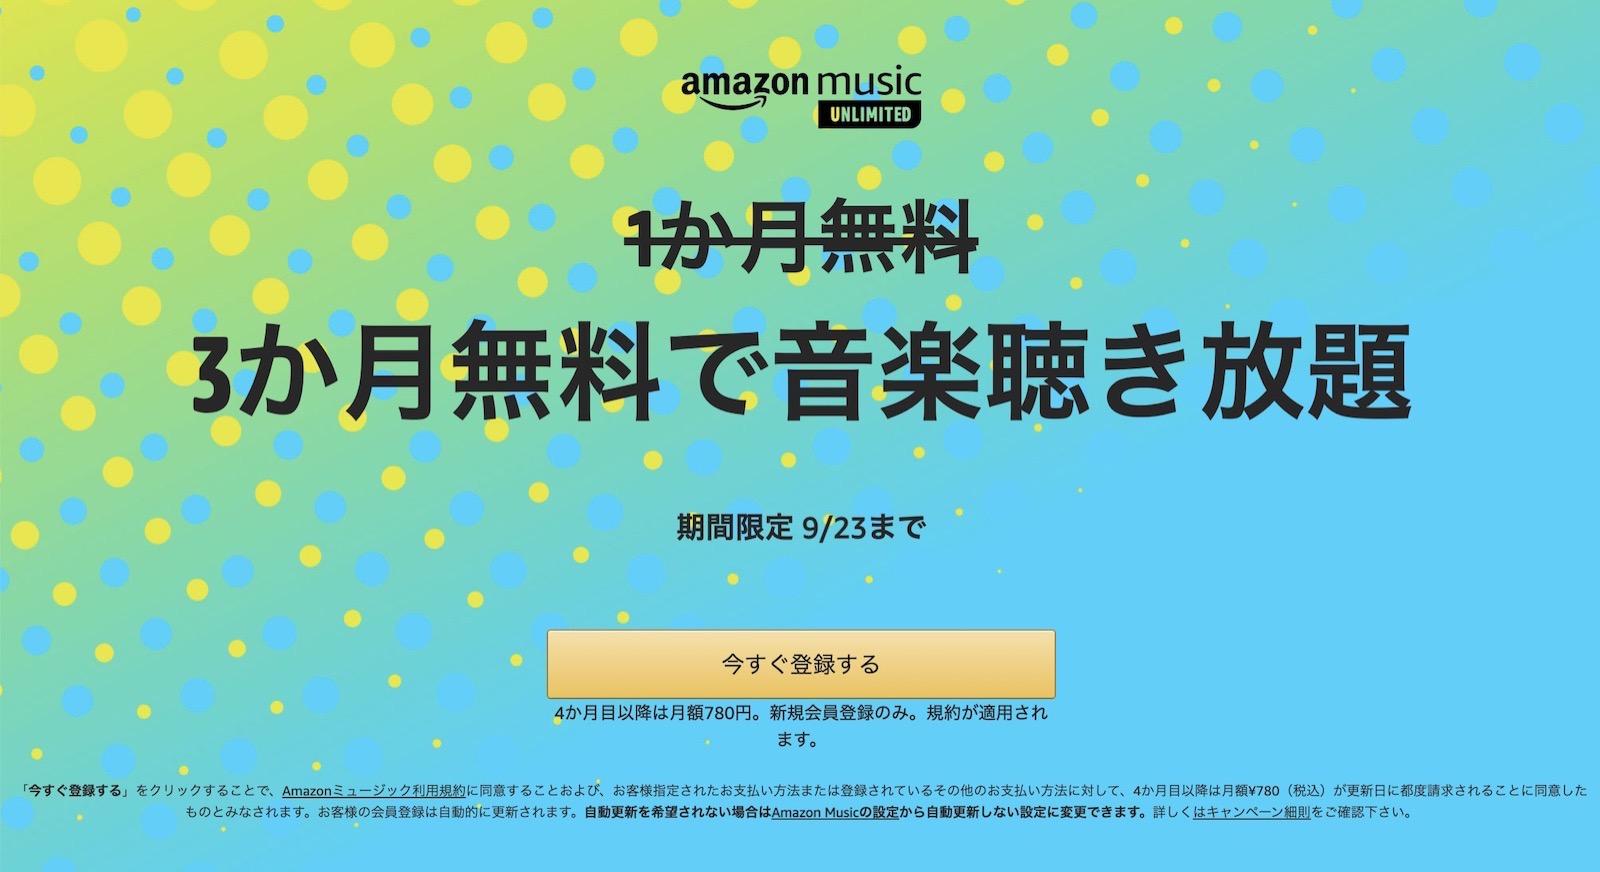 Amazon Music Unlimited Campaign